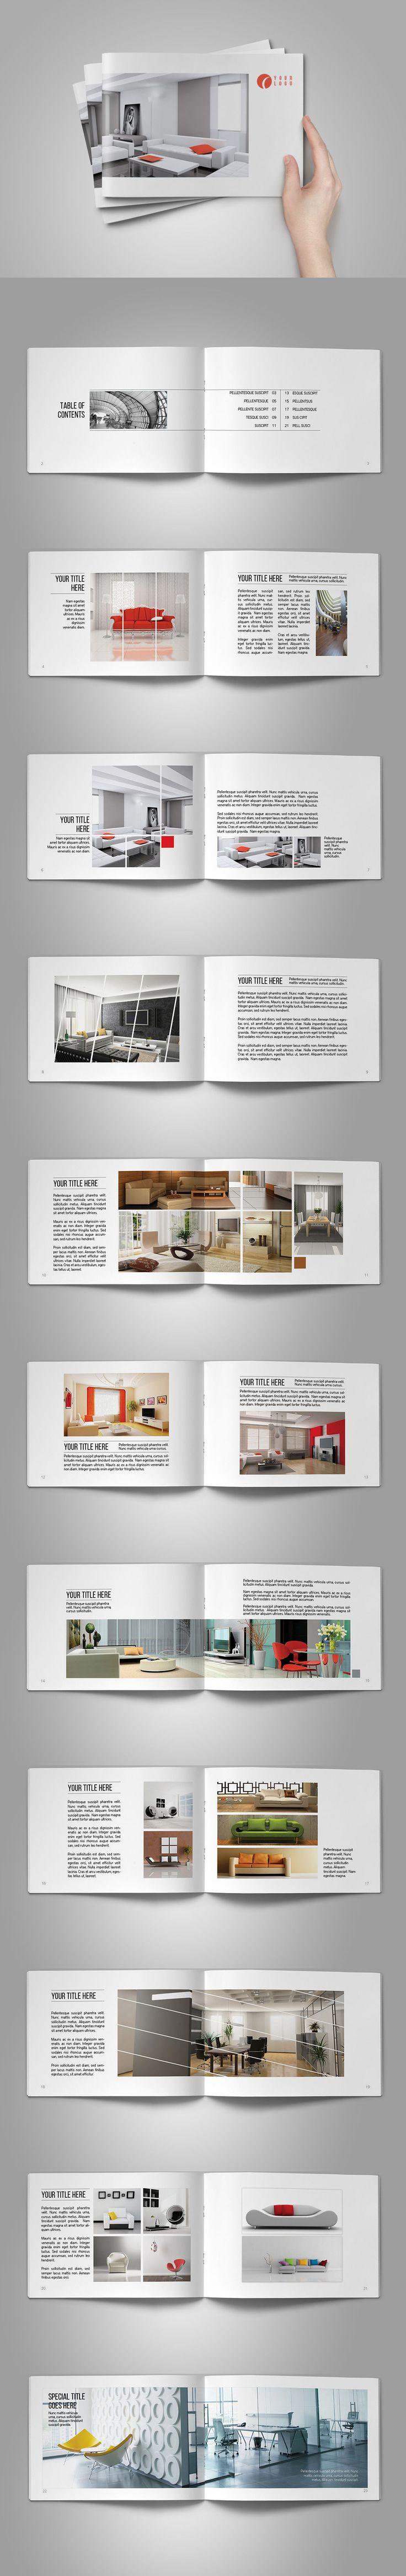 25 best ideas about architecture portfolio layout on